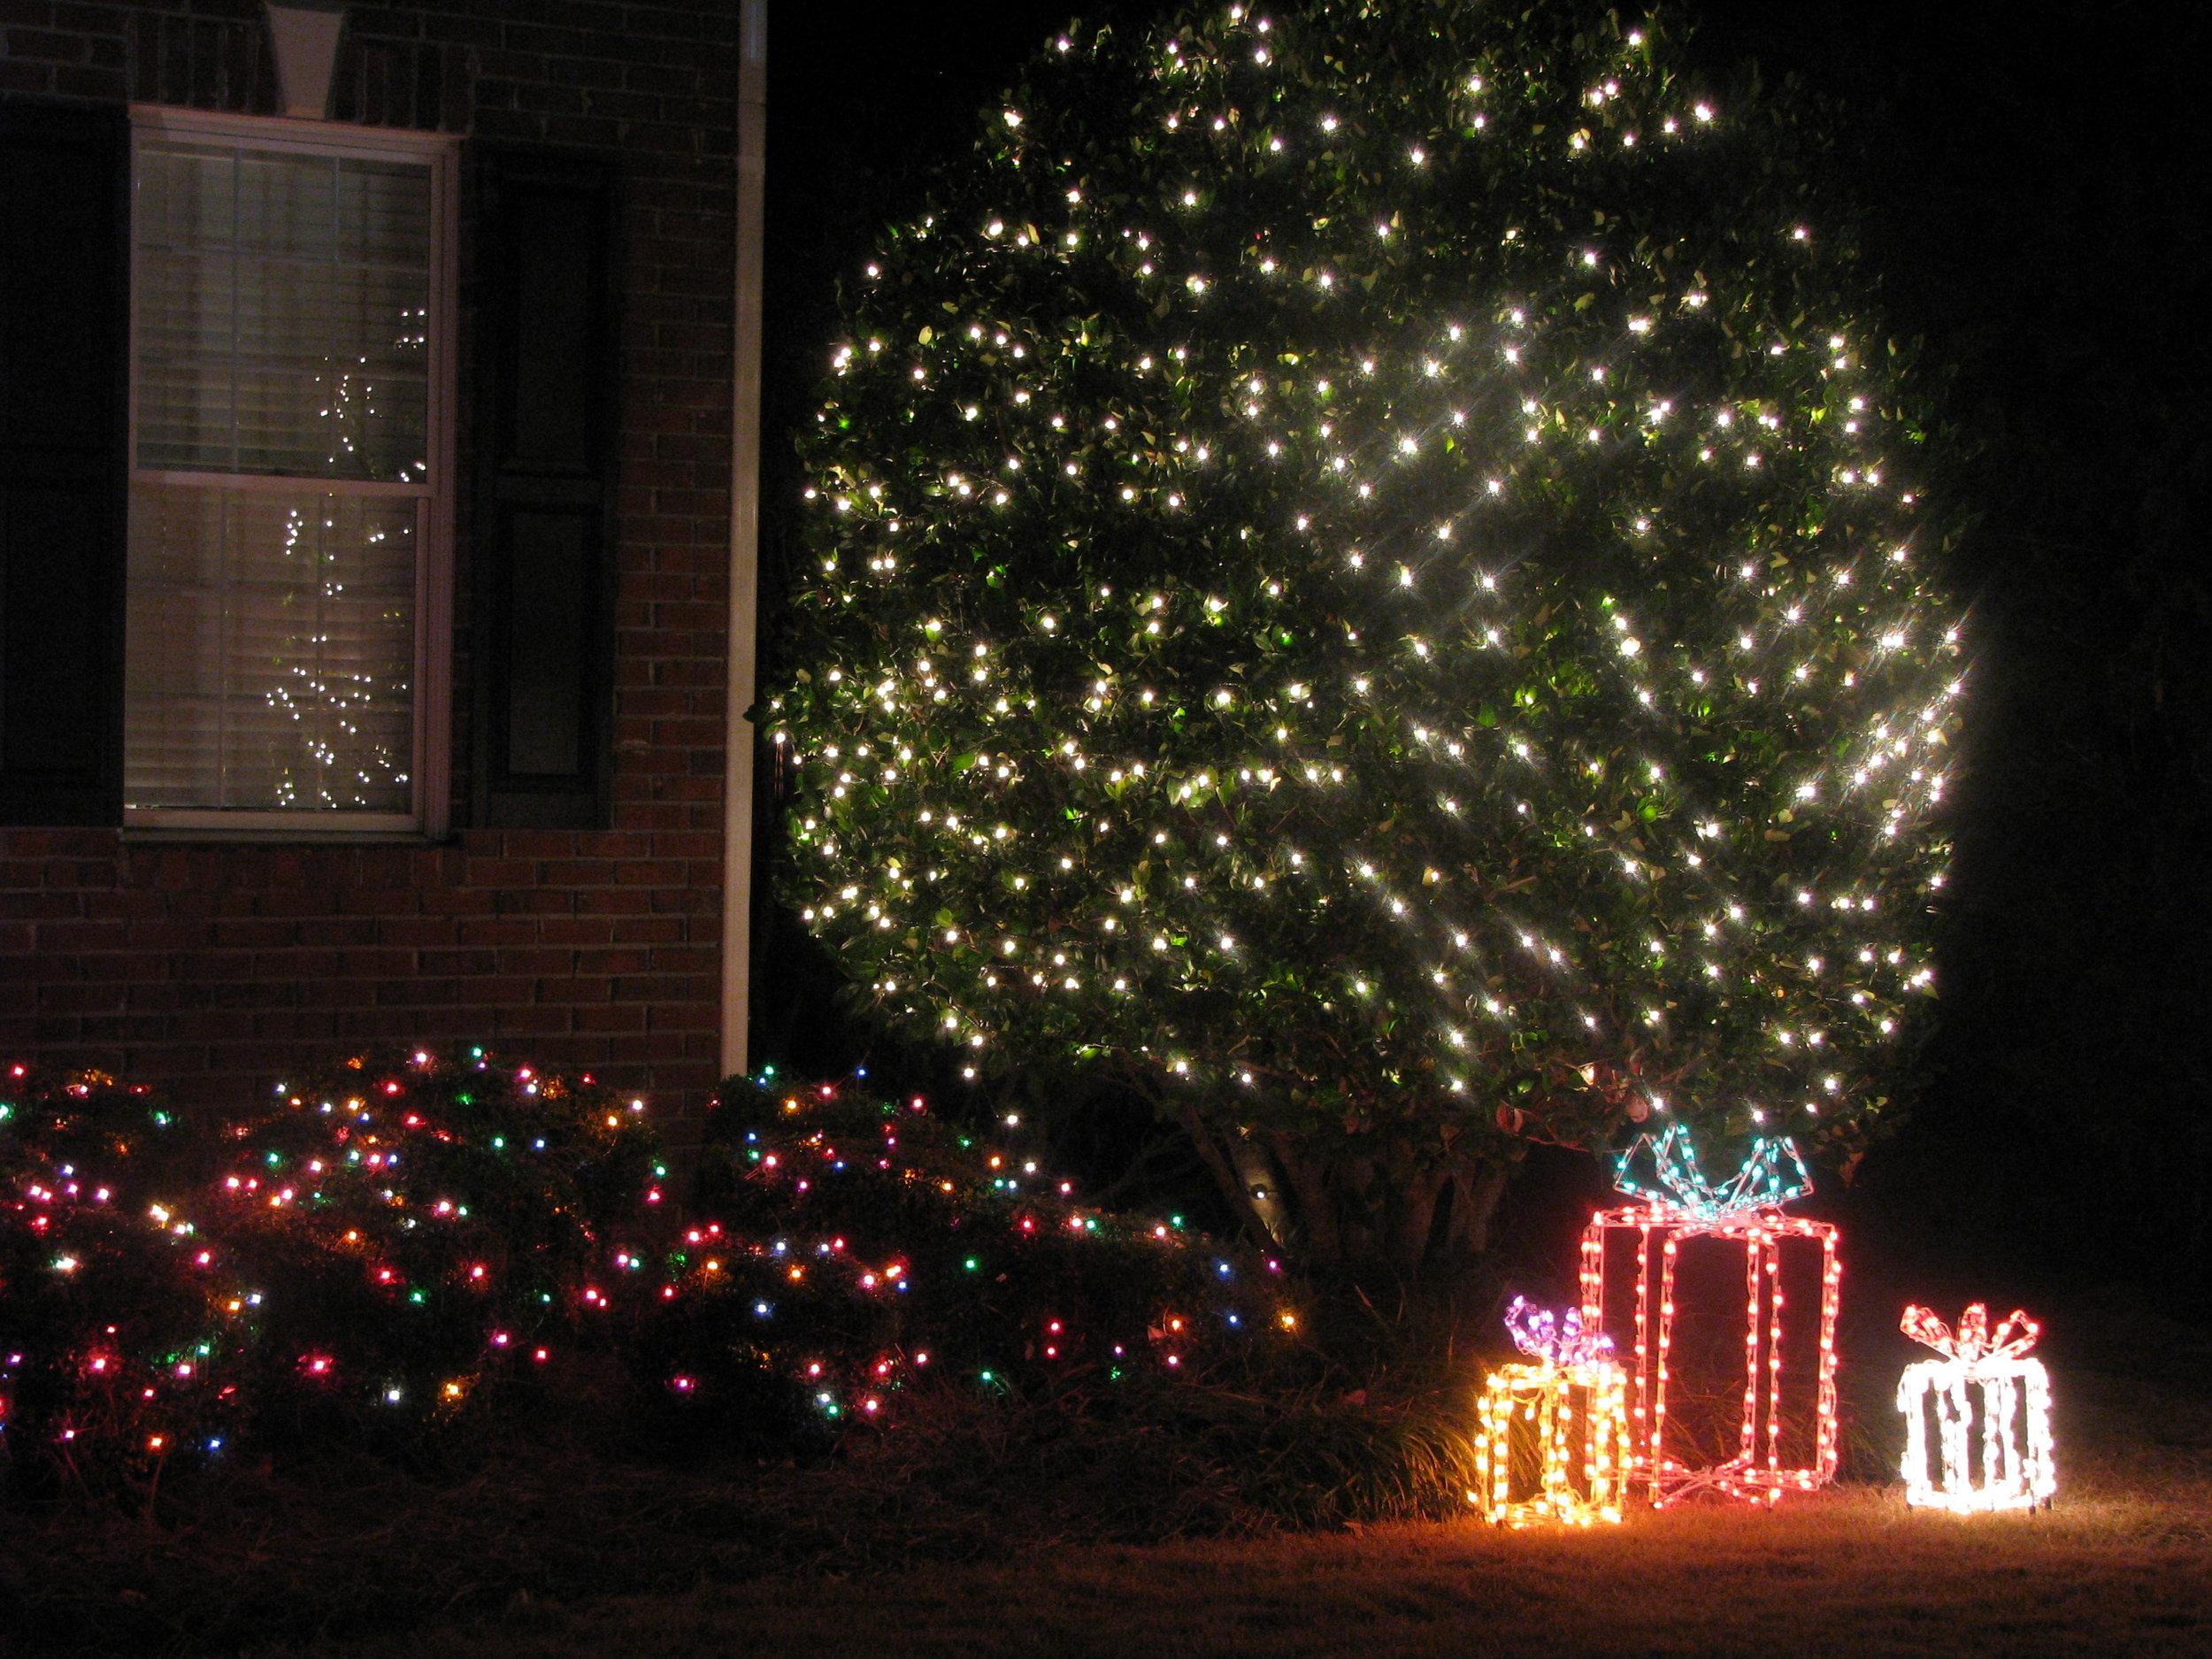 glitter and glow chrismas decor residential exterior (7).JPG